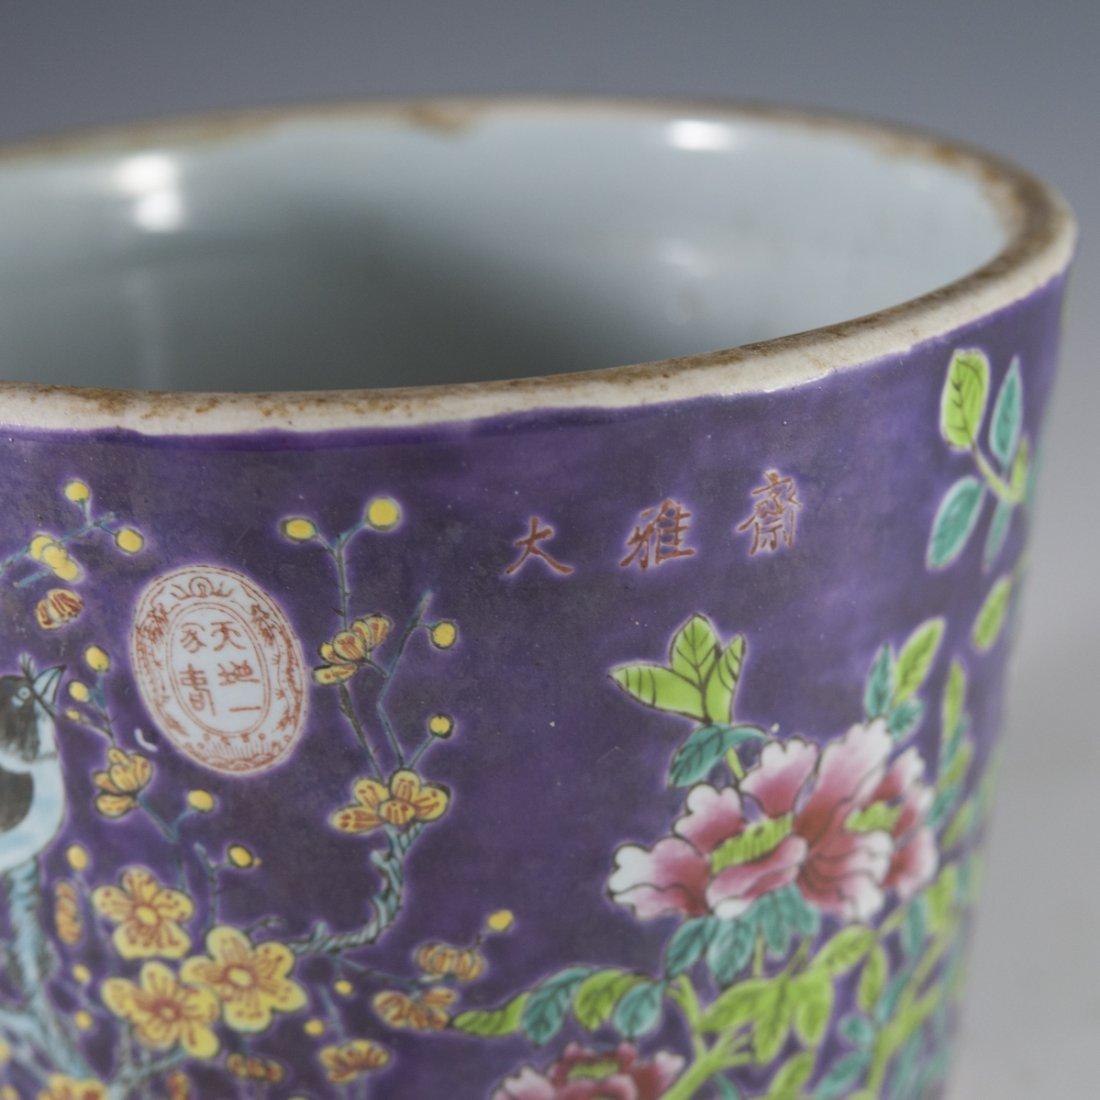 Chinese Porcelain Daya Zhai Cache Pot - 6